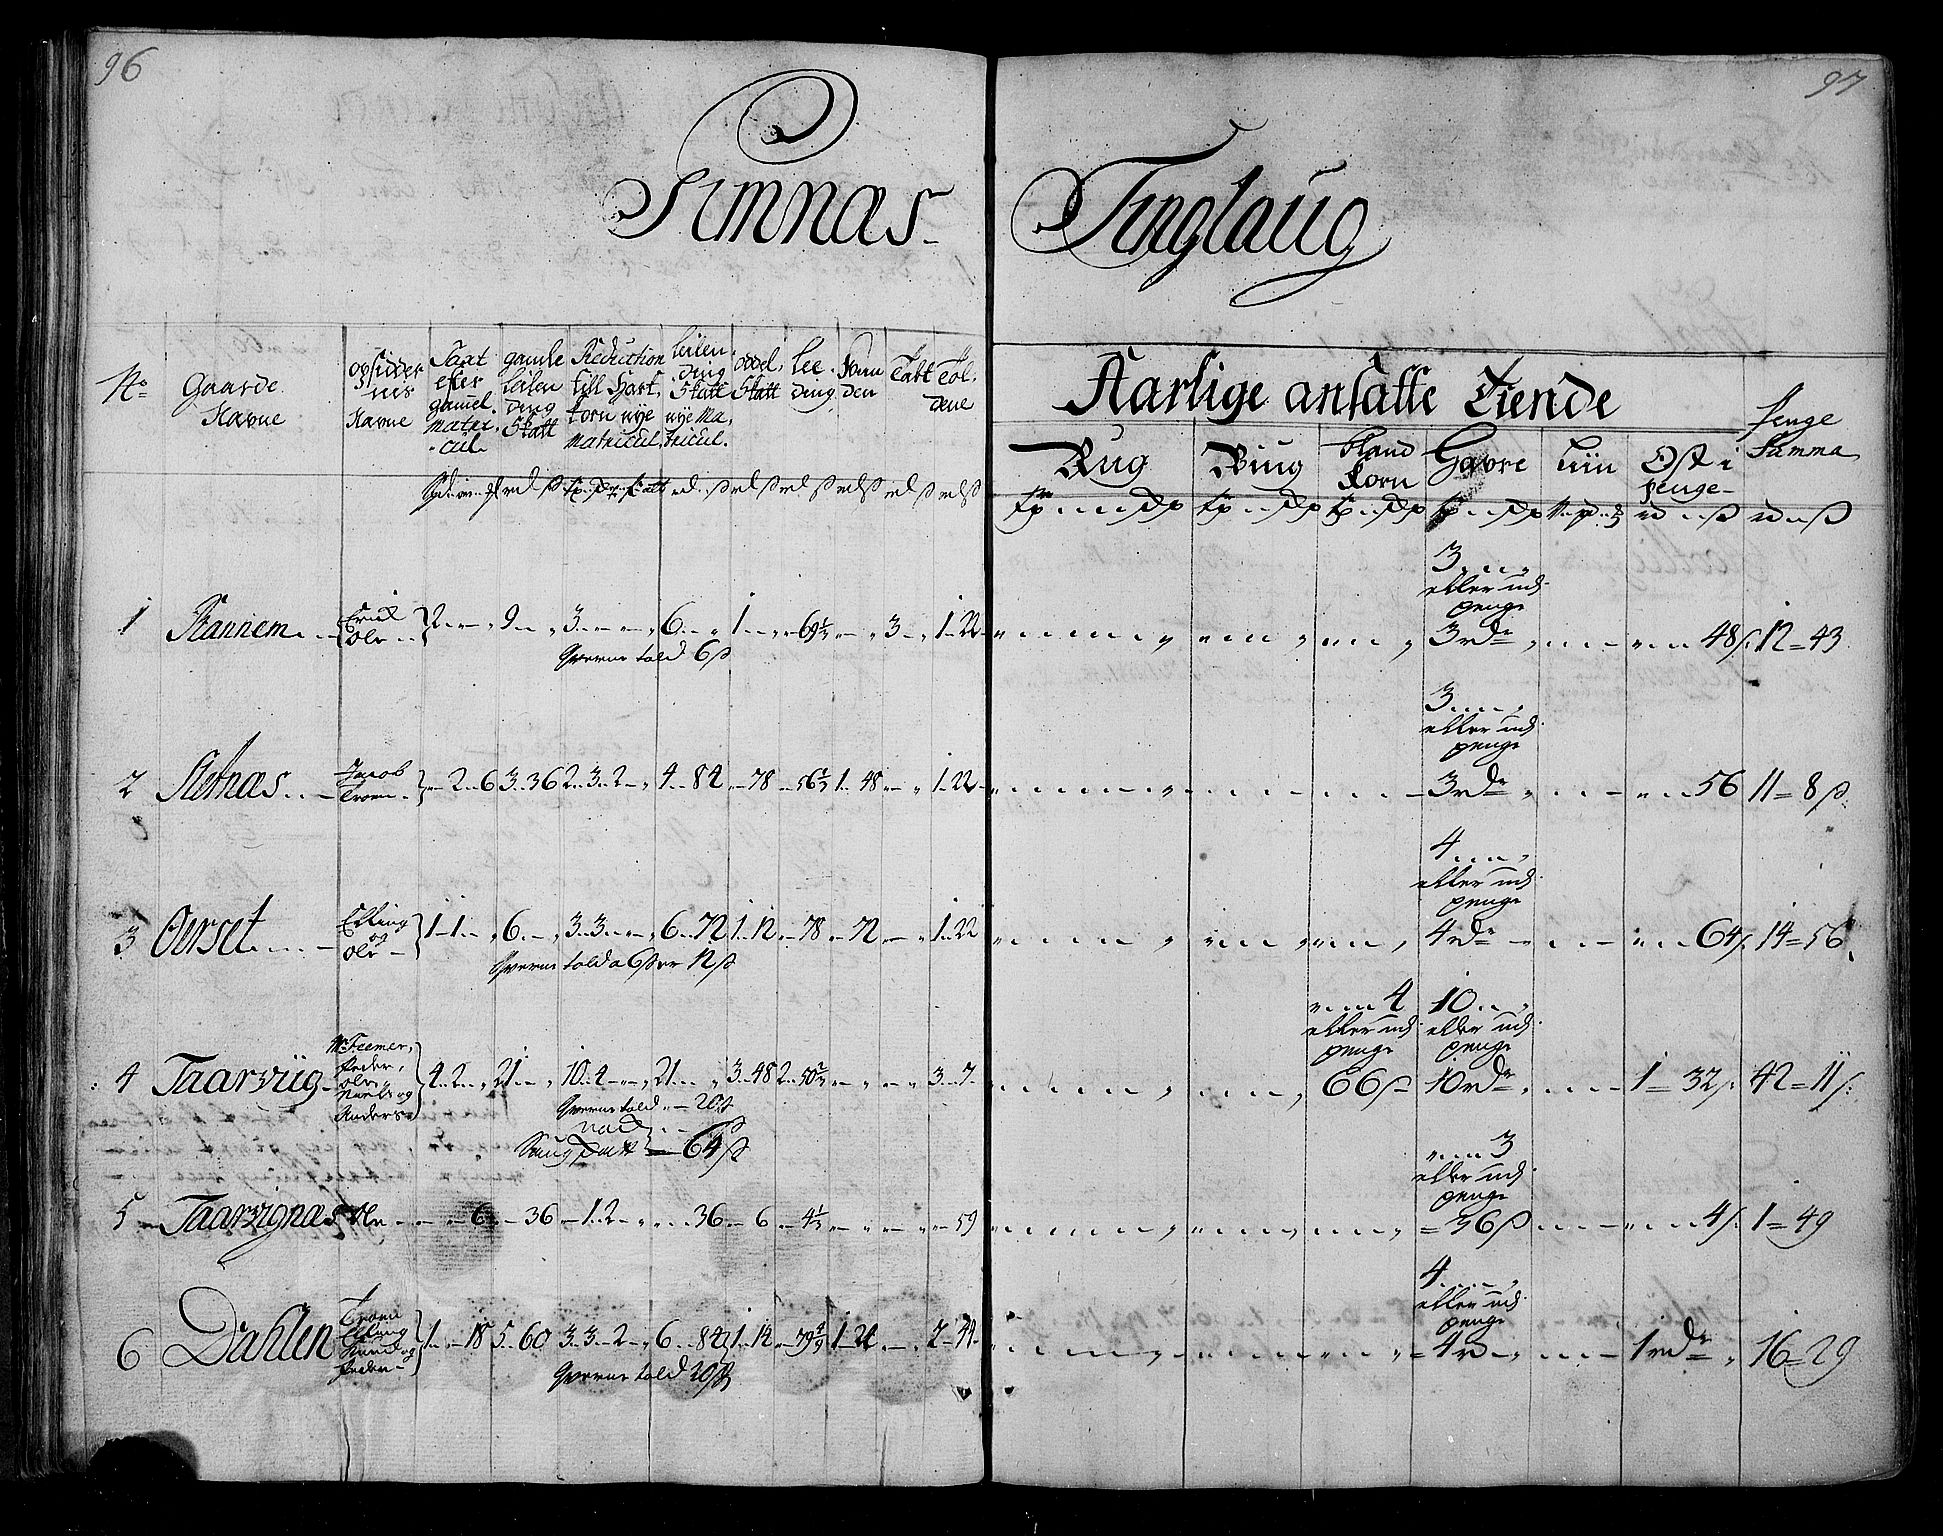 RA, Rentekammeret inntil 1814, Realistisk ordnet avdeling, N/Nb/Nbf/L0155: Nordmøre matrikkelprotokoll, 1721-1723, s. 96-97